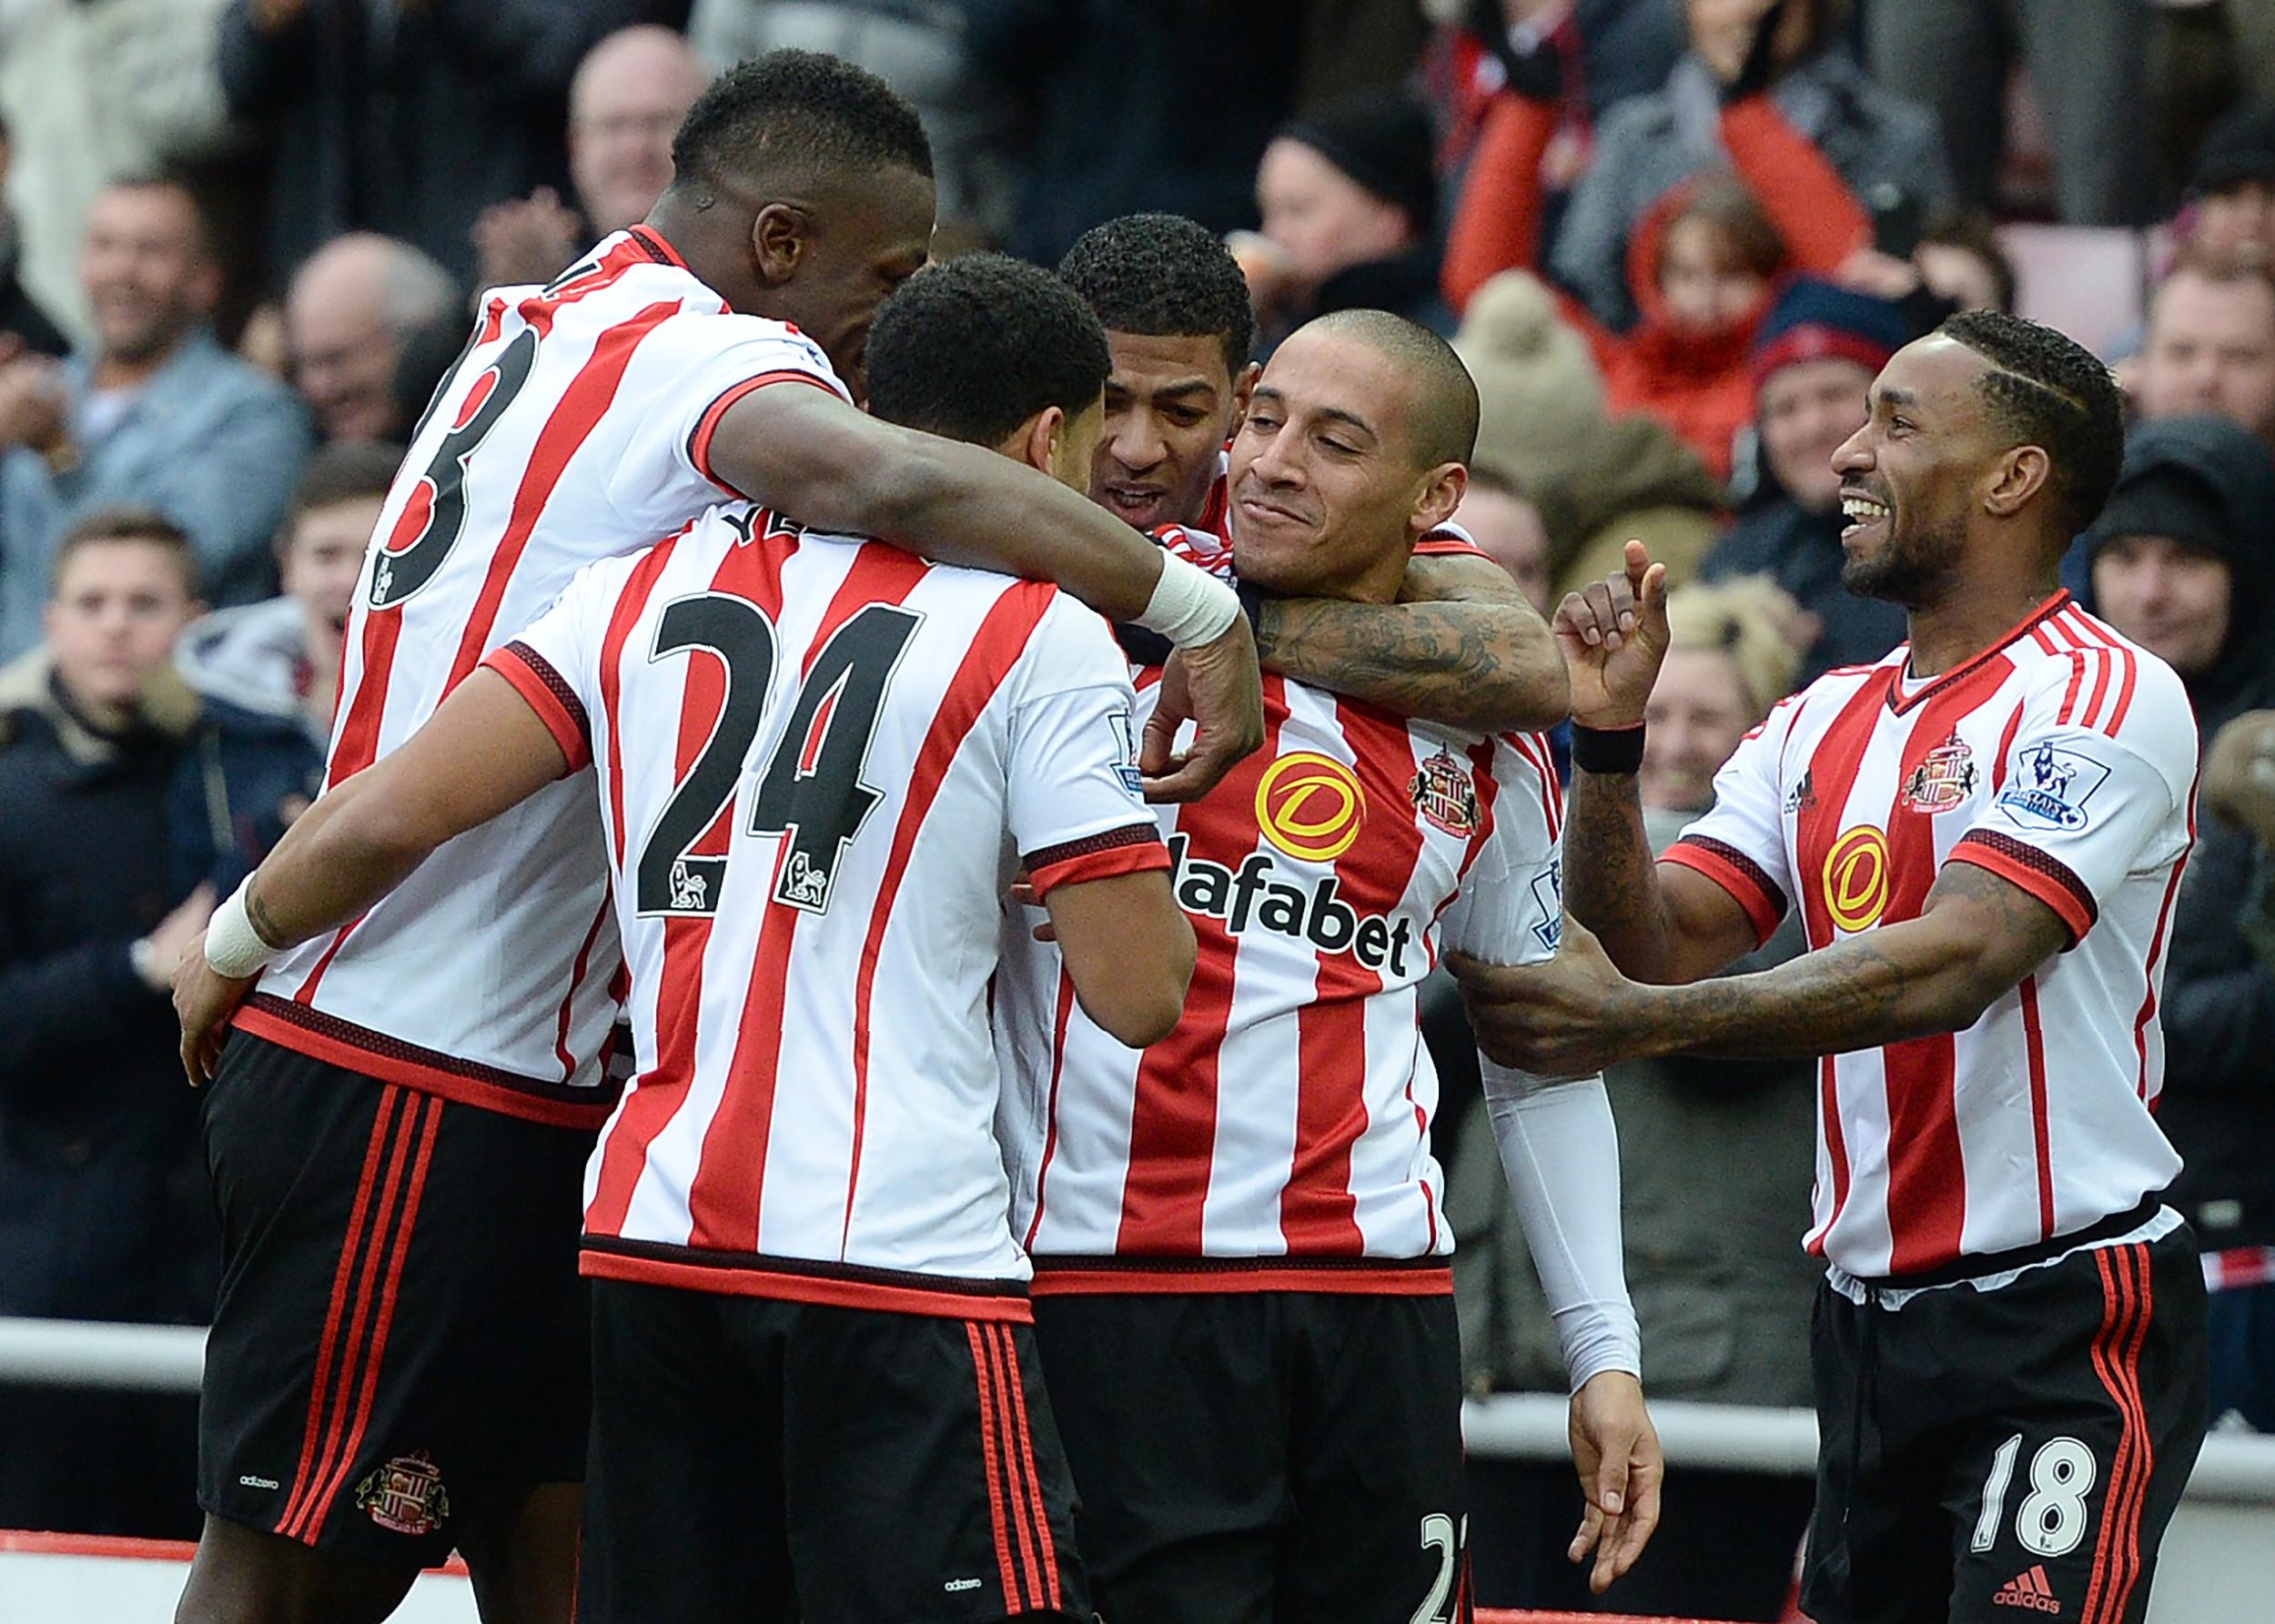 Sunderland's French-born Tunisian midfielder Wahbi Khazri (2R) celebrates scoring his team's first goal